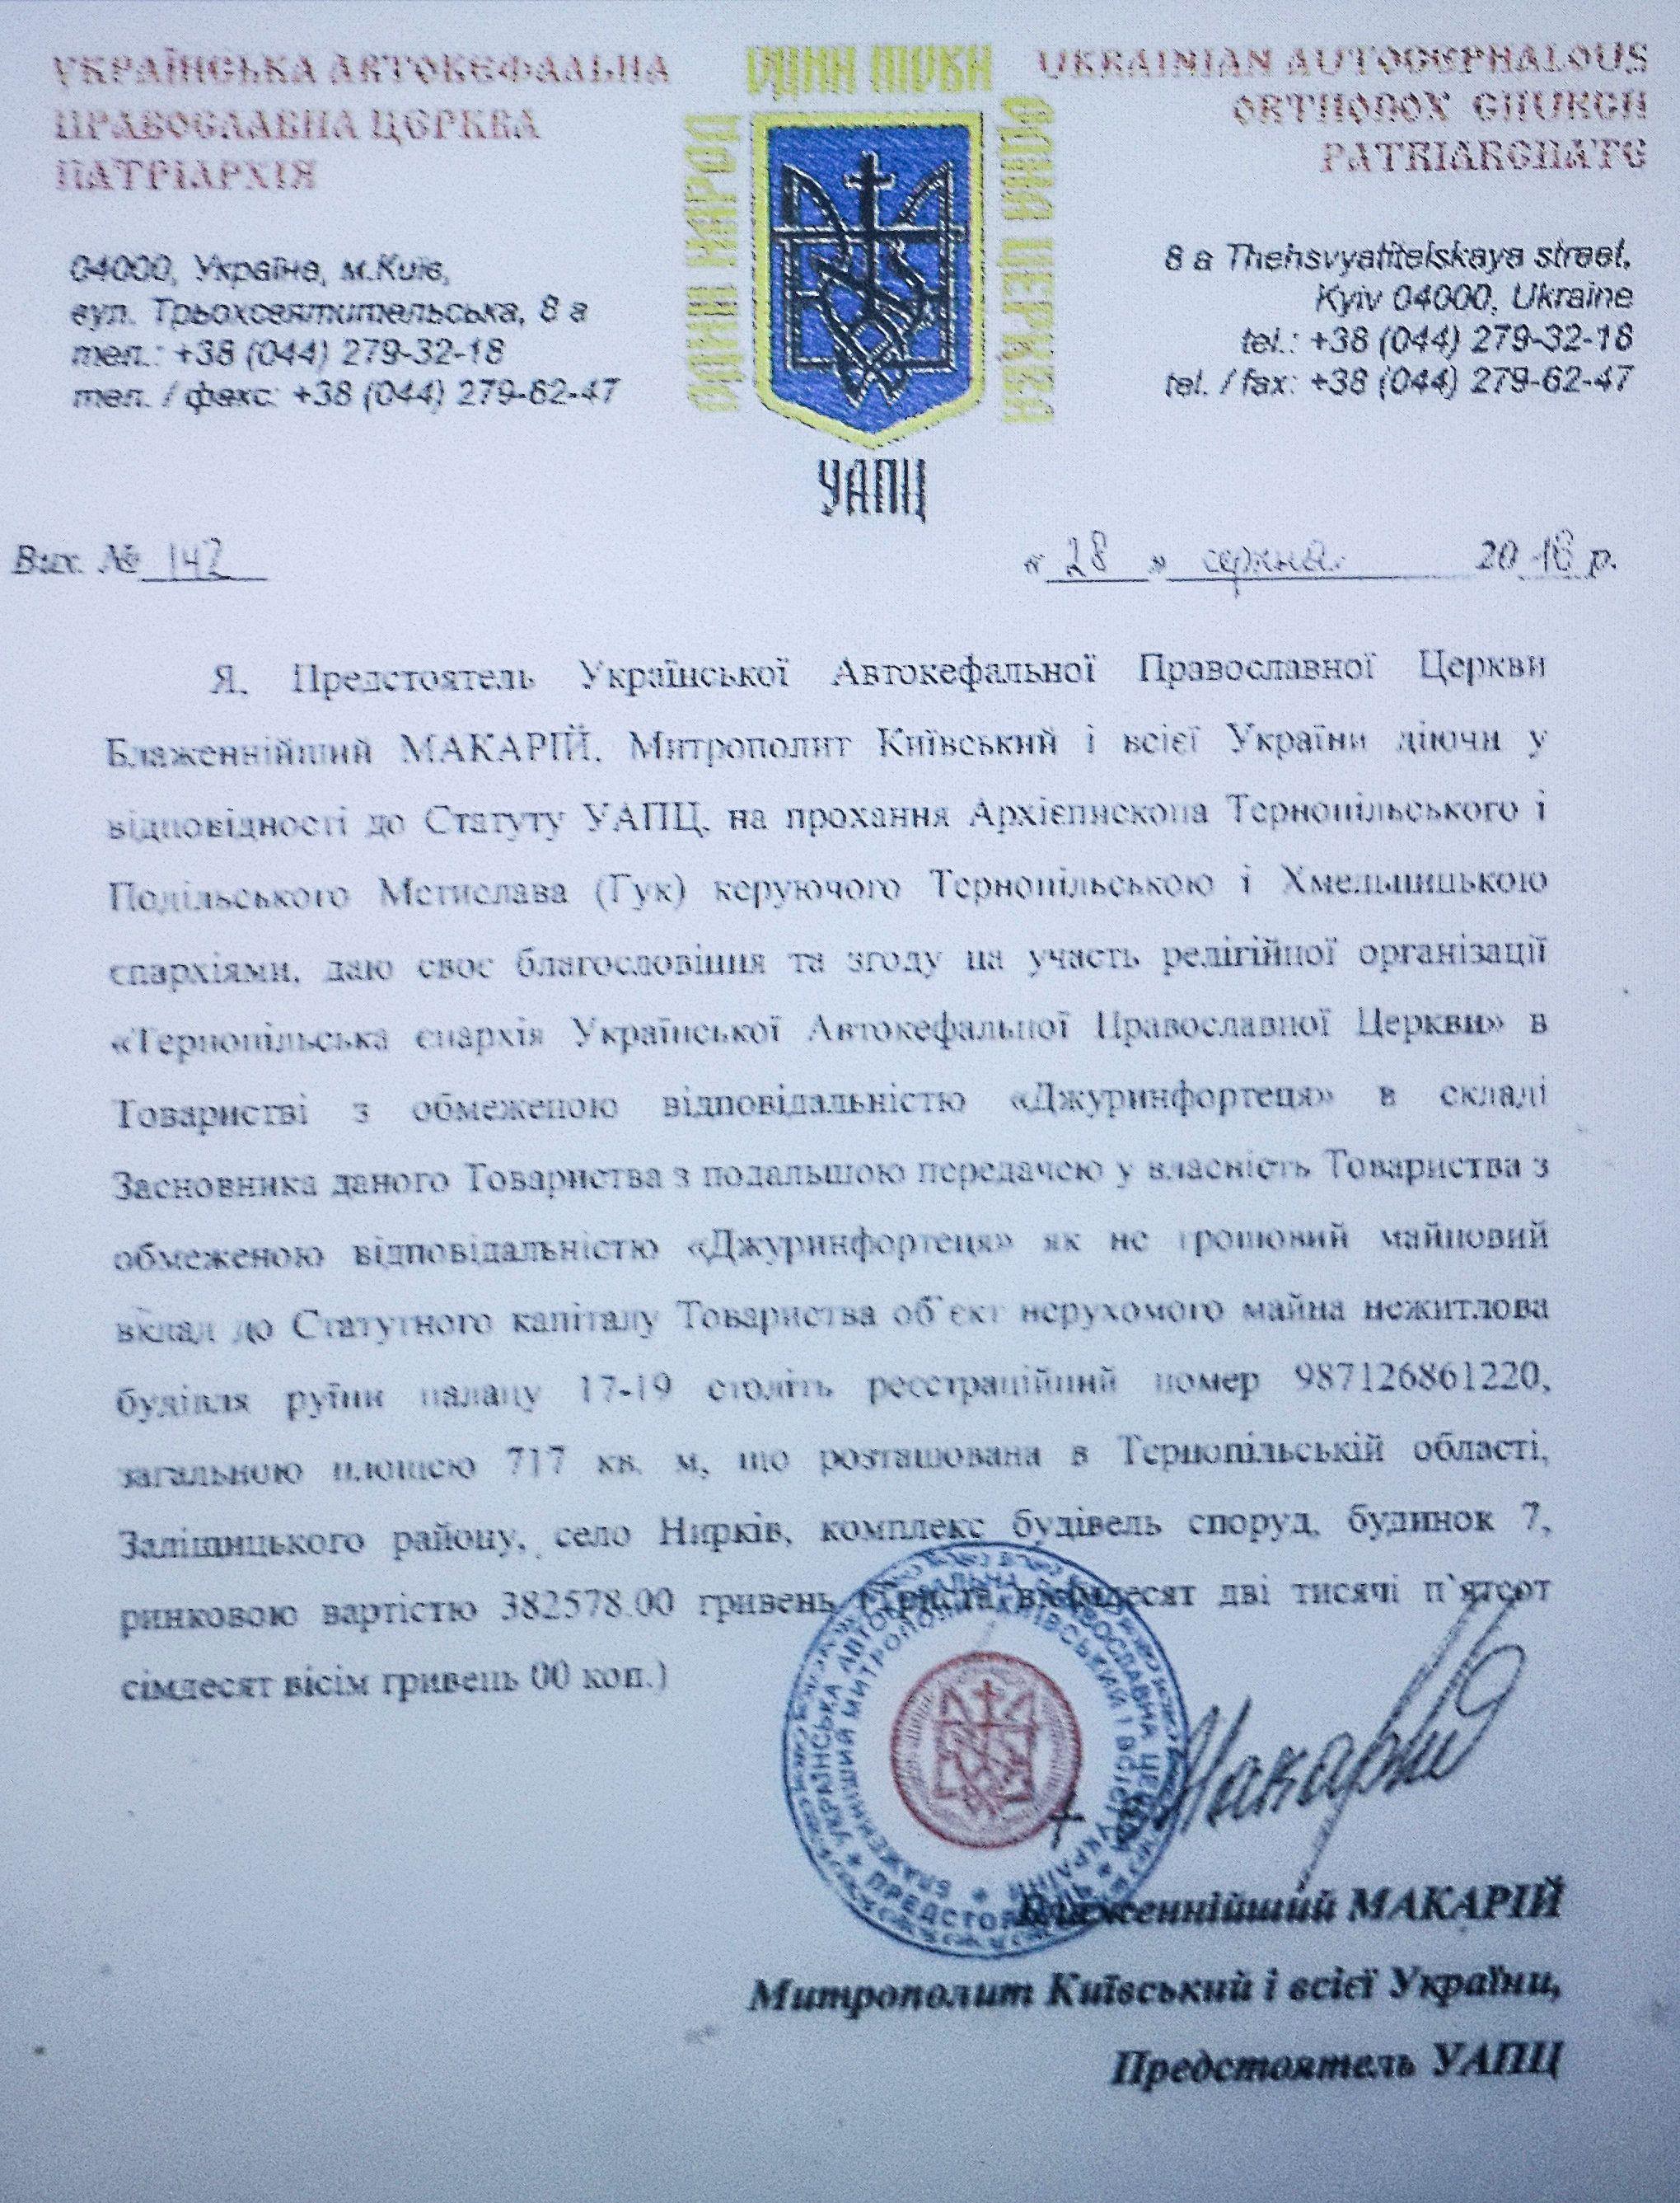 Документи по священику Мстиславу